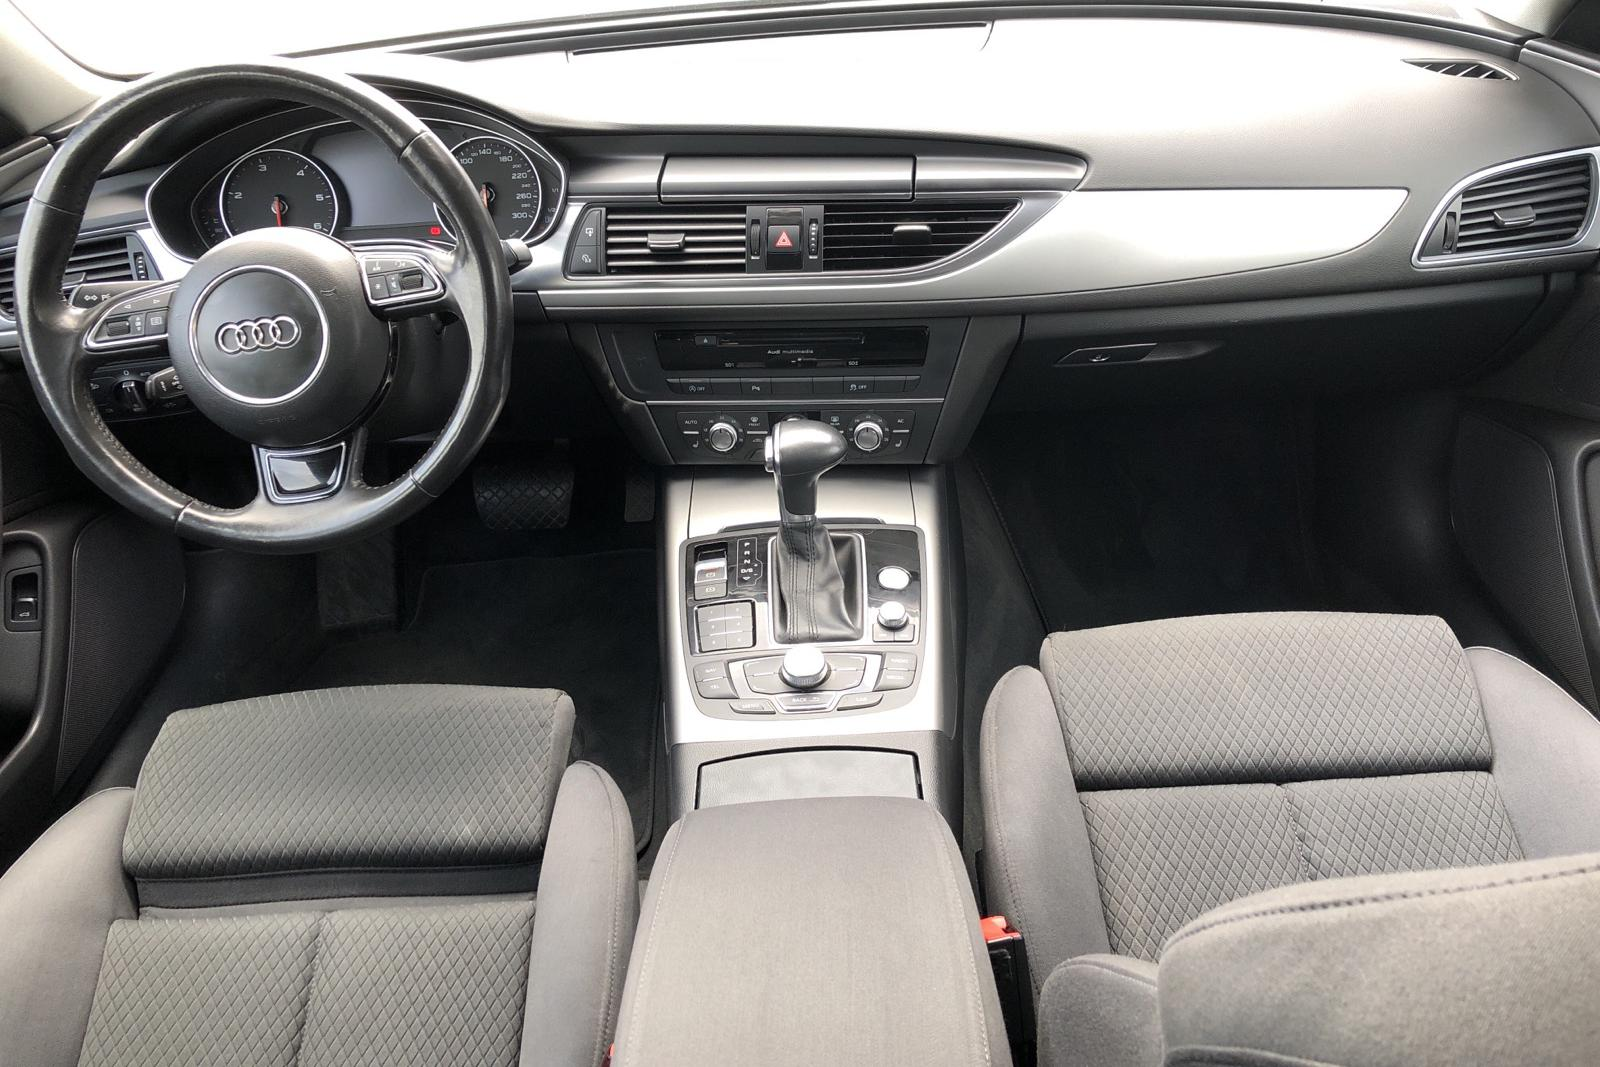 Audi A6 2.0 TDI Avant (177hk) - 248 730 km - Automatic - gray - 2013